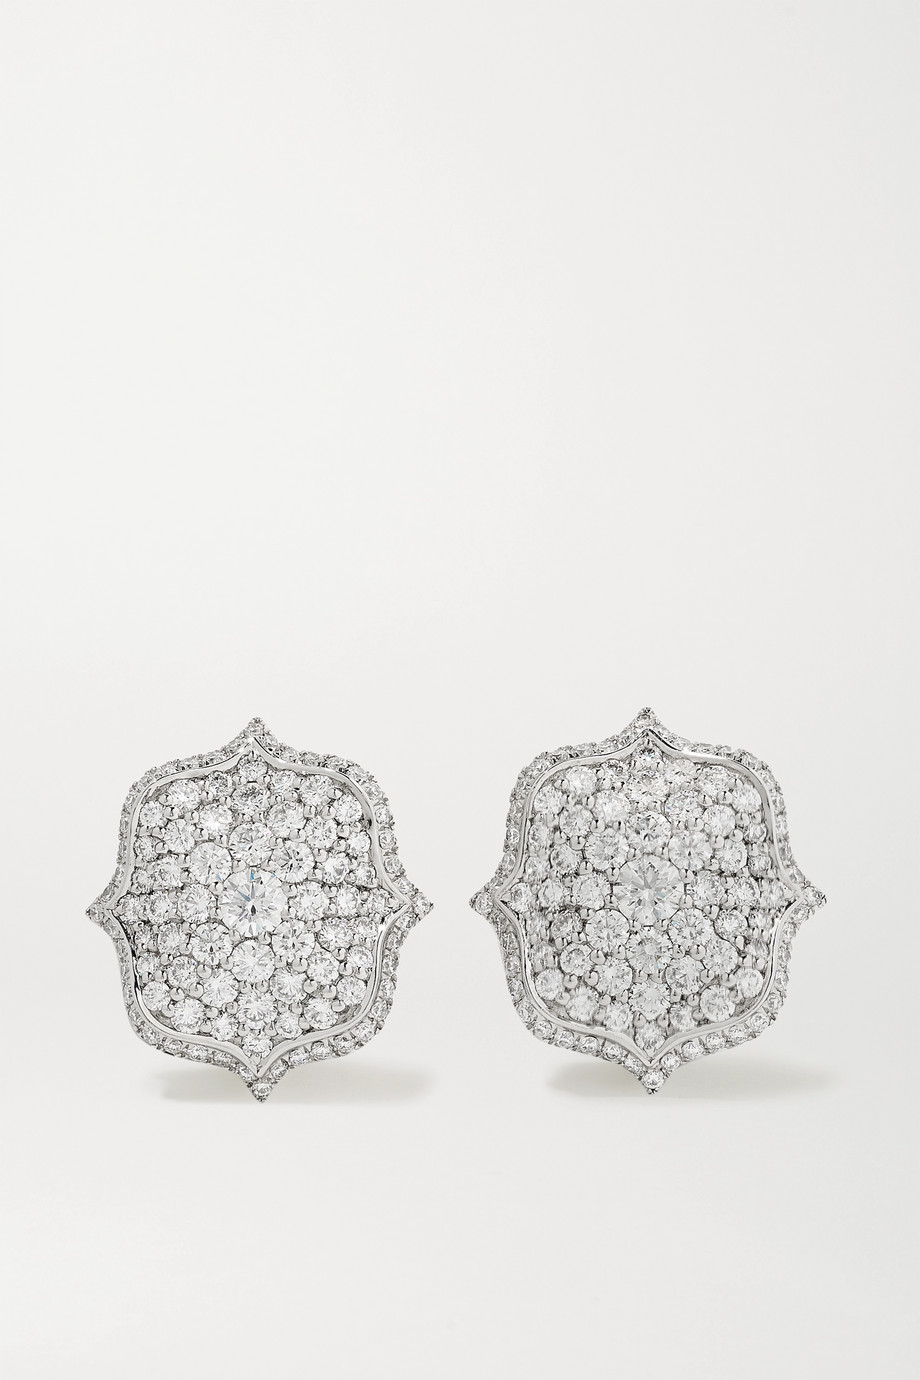 Bayco Ohrringe aus Platin mit Diamanten